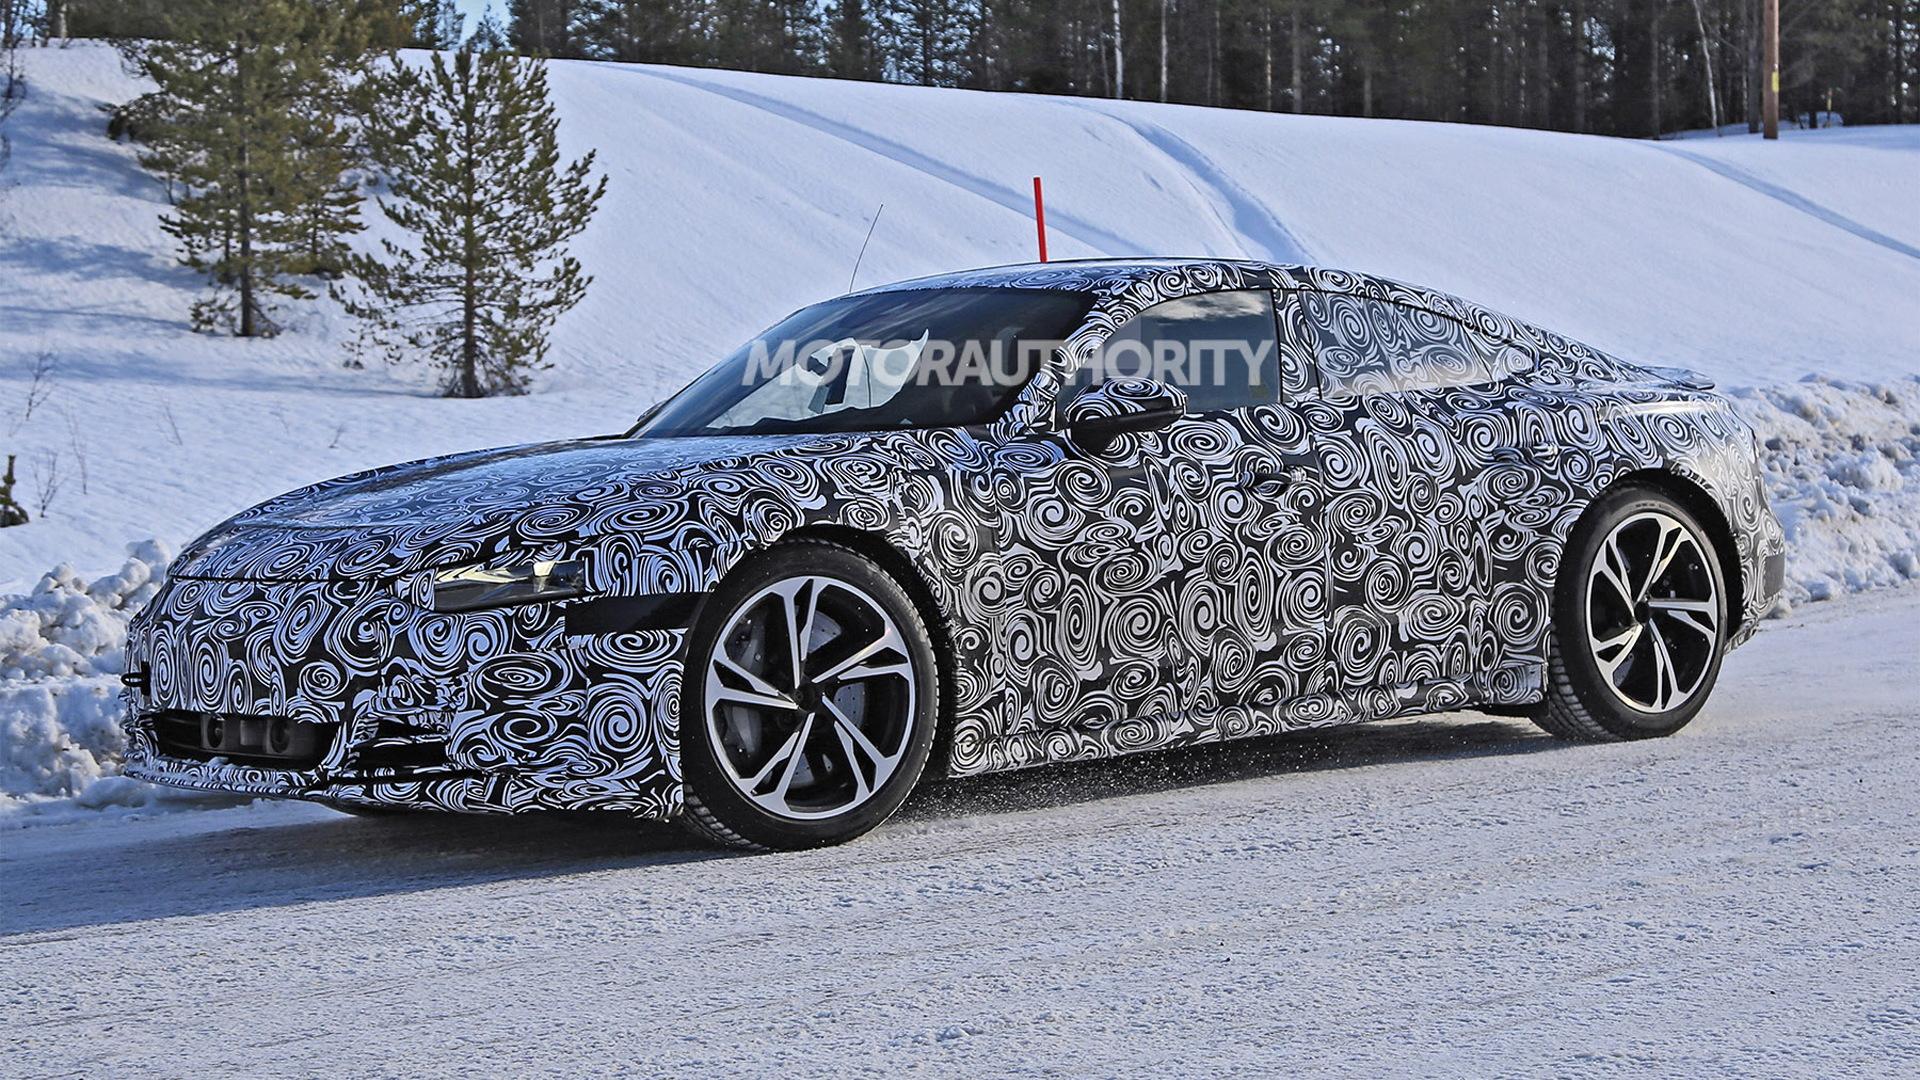 2022 Audi E-Tron GT spy shots - Photo credit:S. Baldauf/SB-Medien